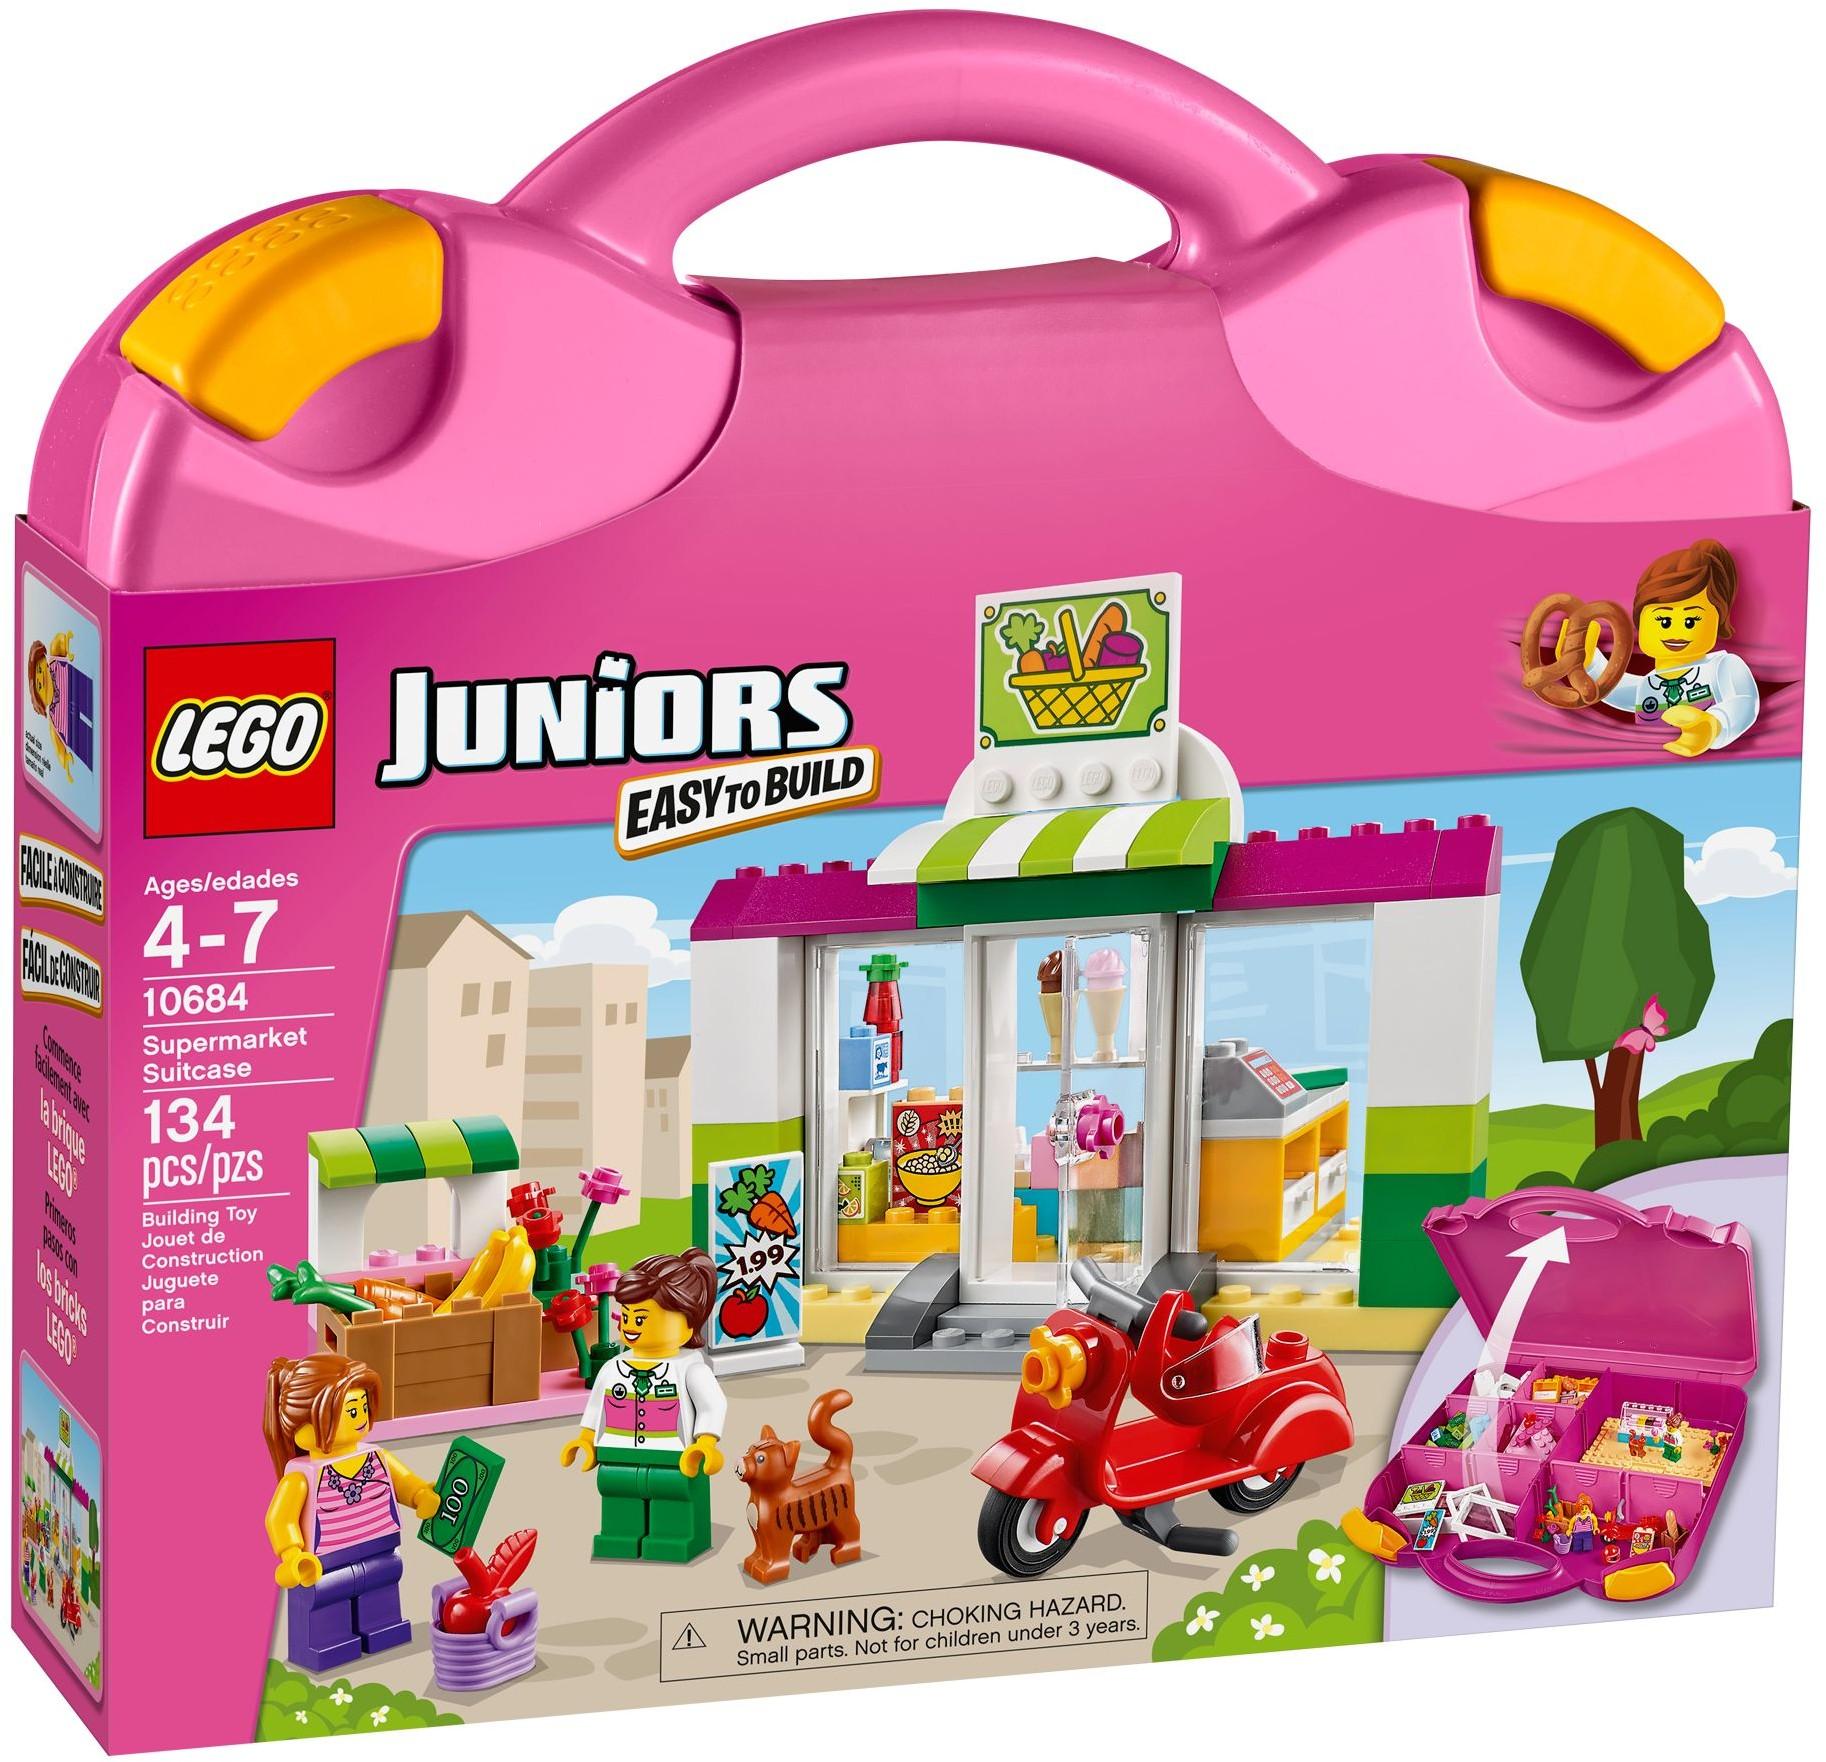 LEGO Juniors - Supermarket Suitcase Set 10684 10684_alt1